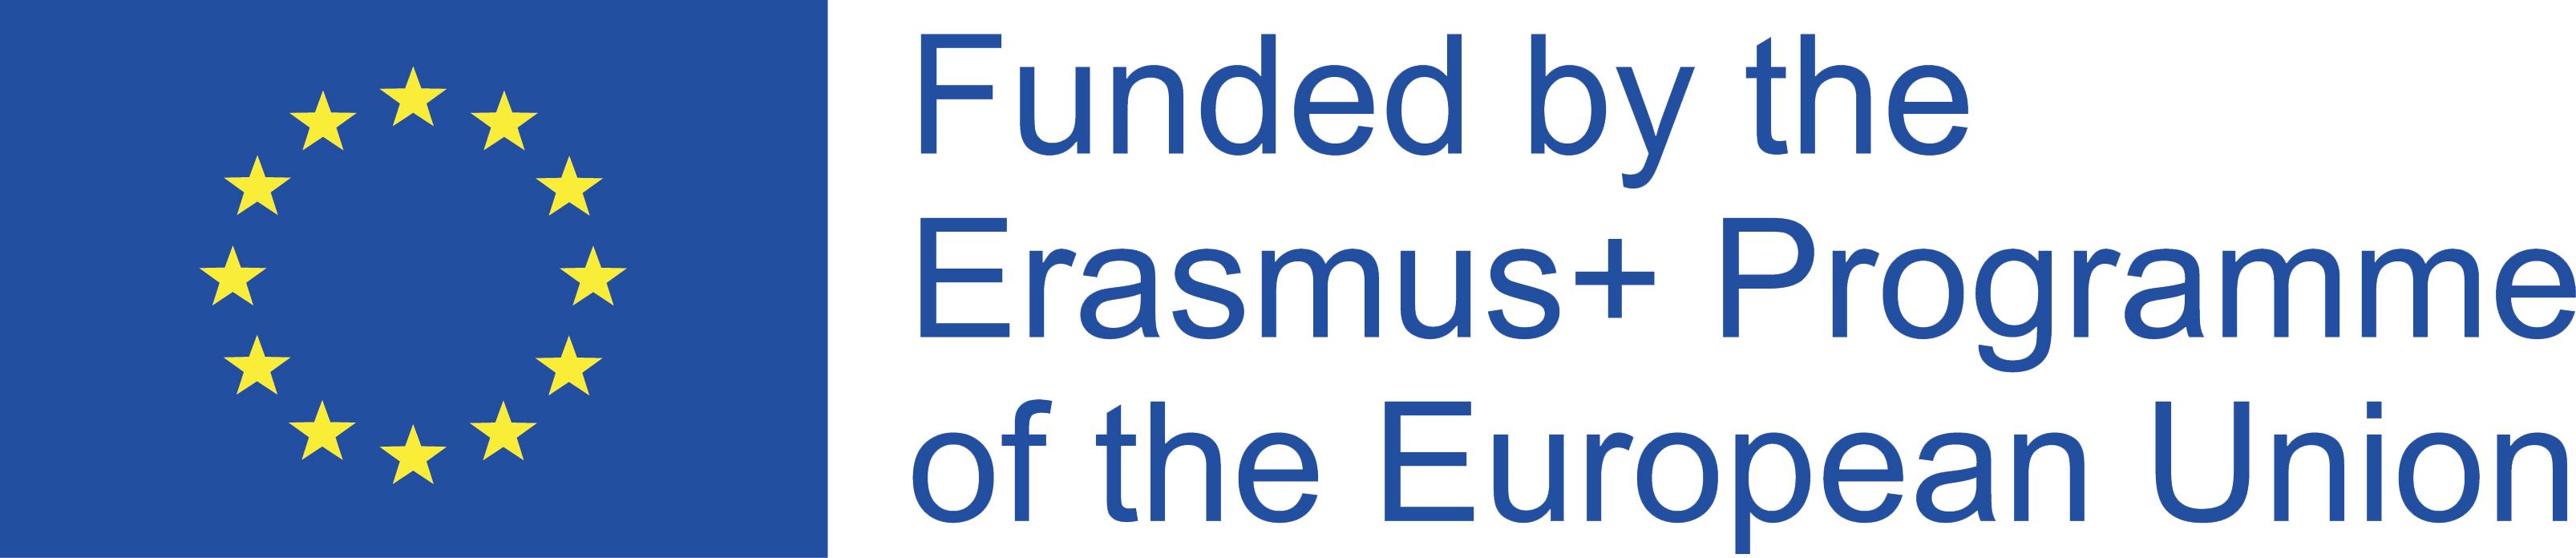 Funded Erasmus